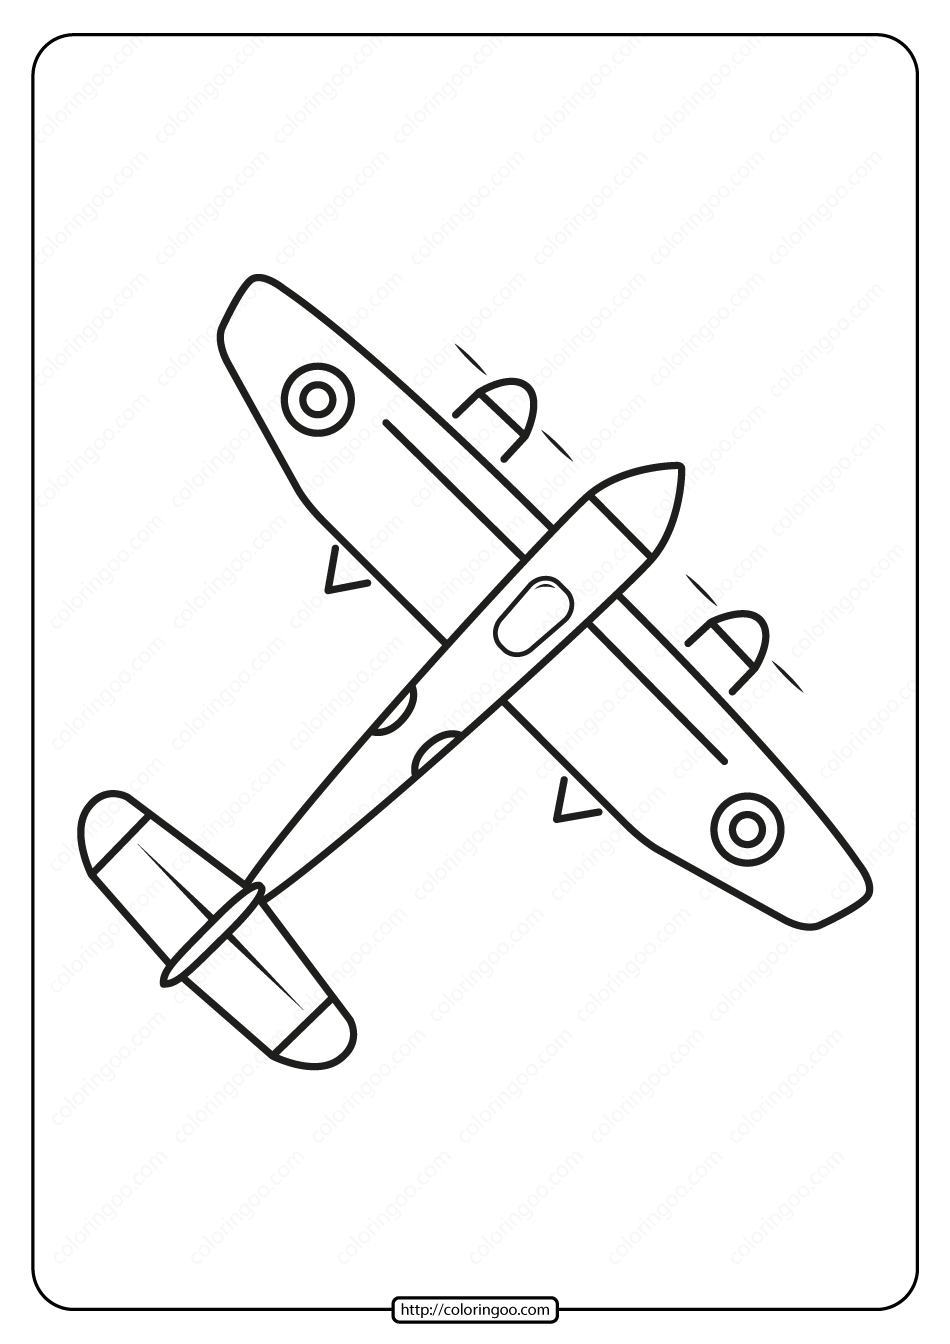 Free Printable Airplane Coloring Page